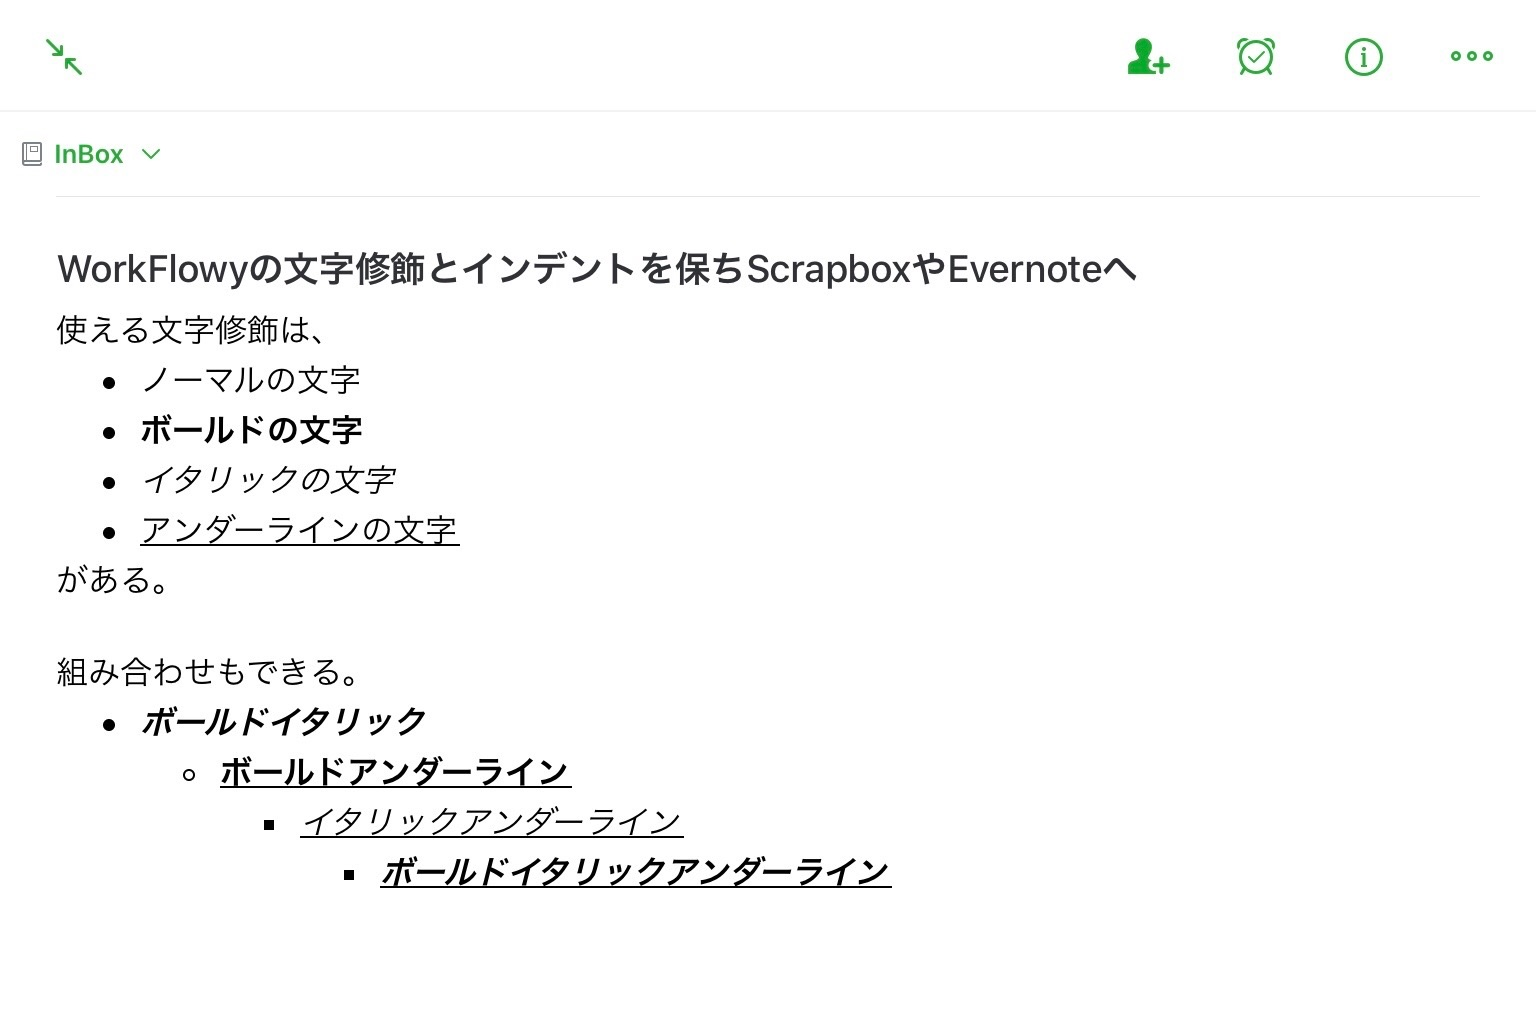 f:id:sorashima:20200801182814j:plain:w637